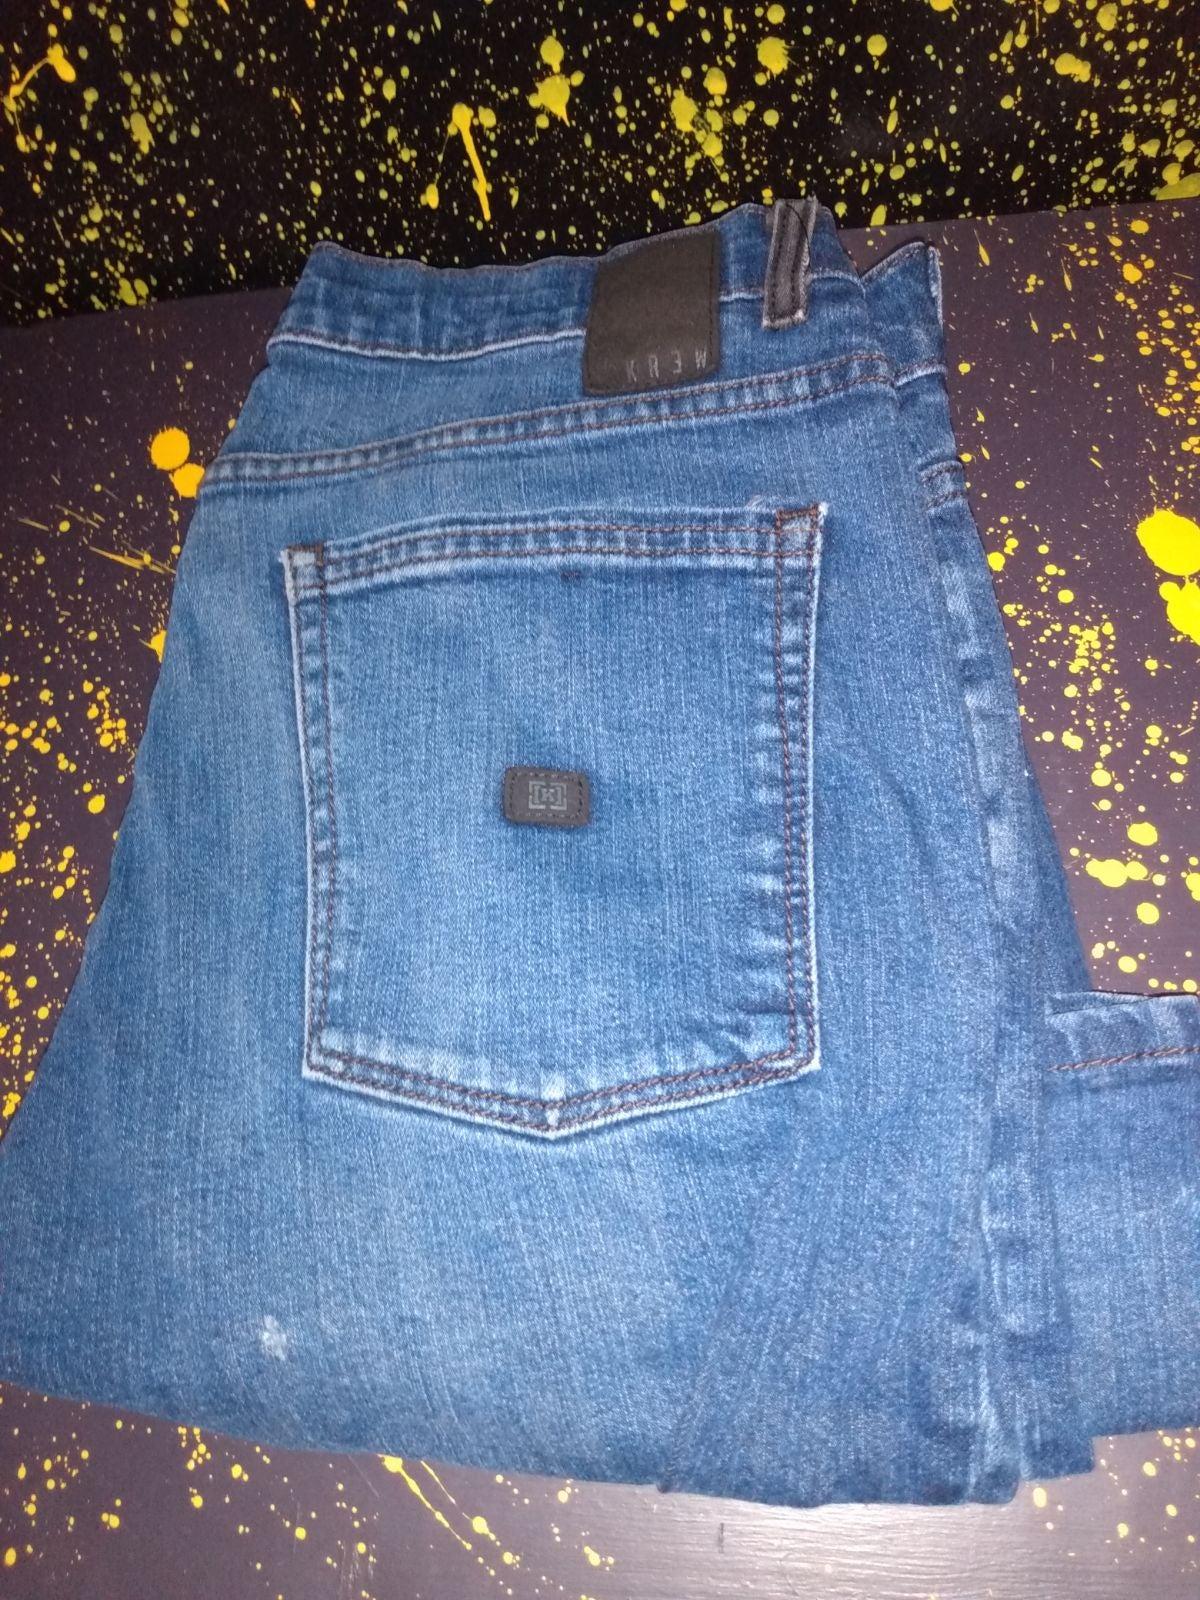 Men's Krew Klassic Jeans 36/32